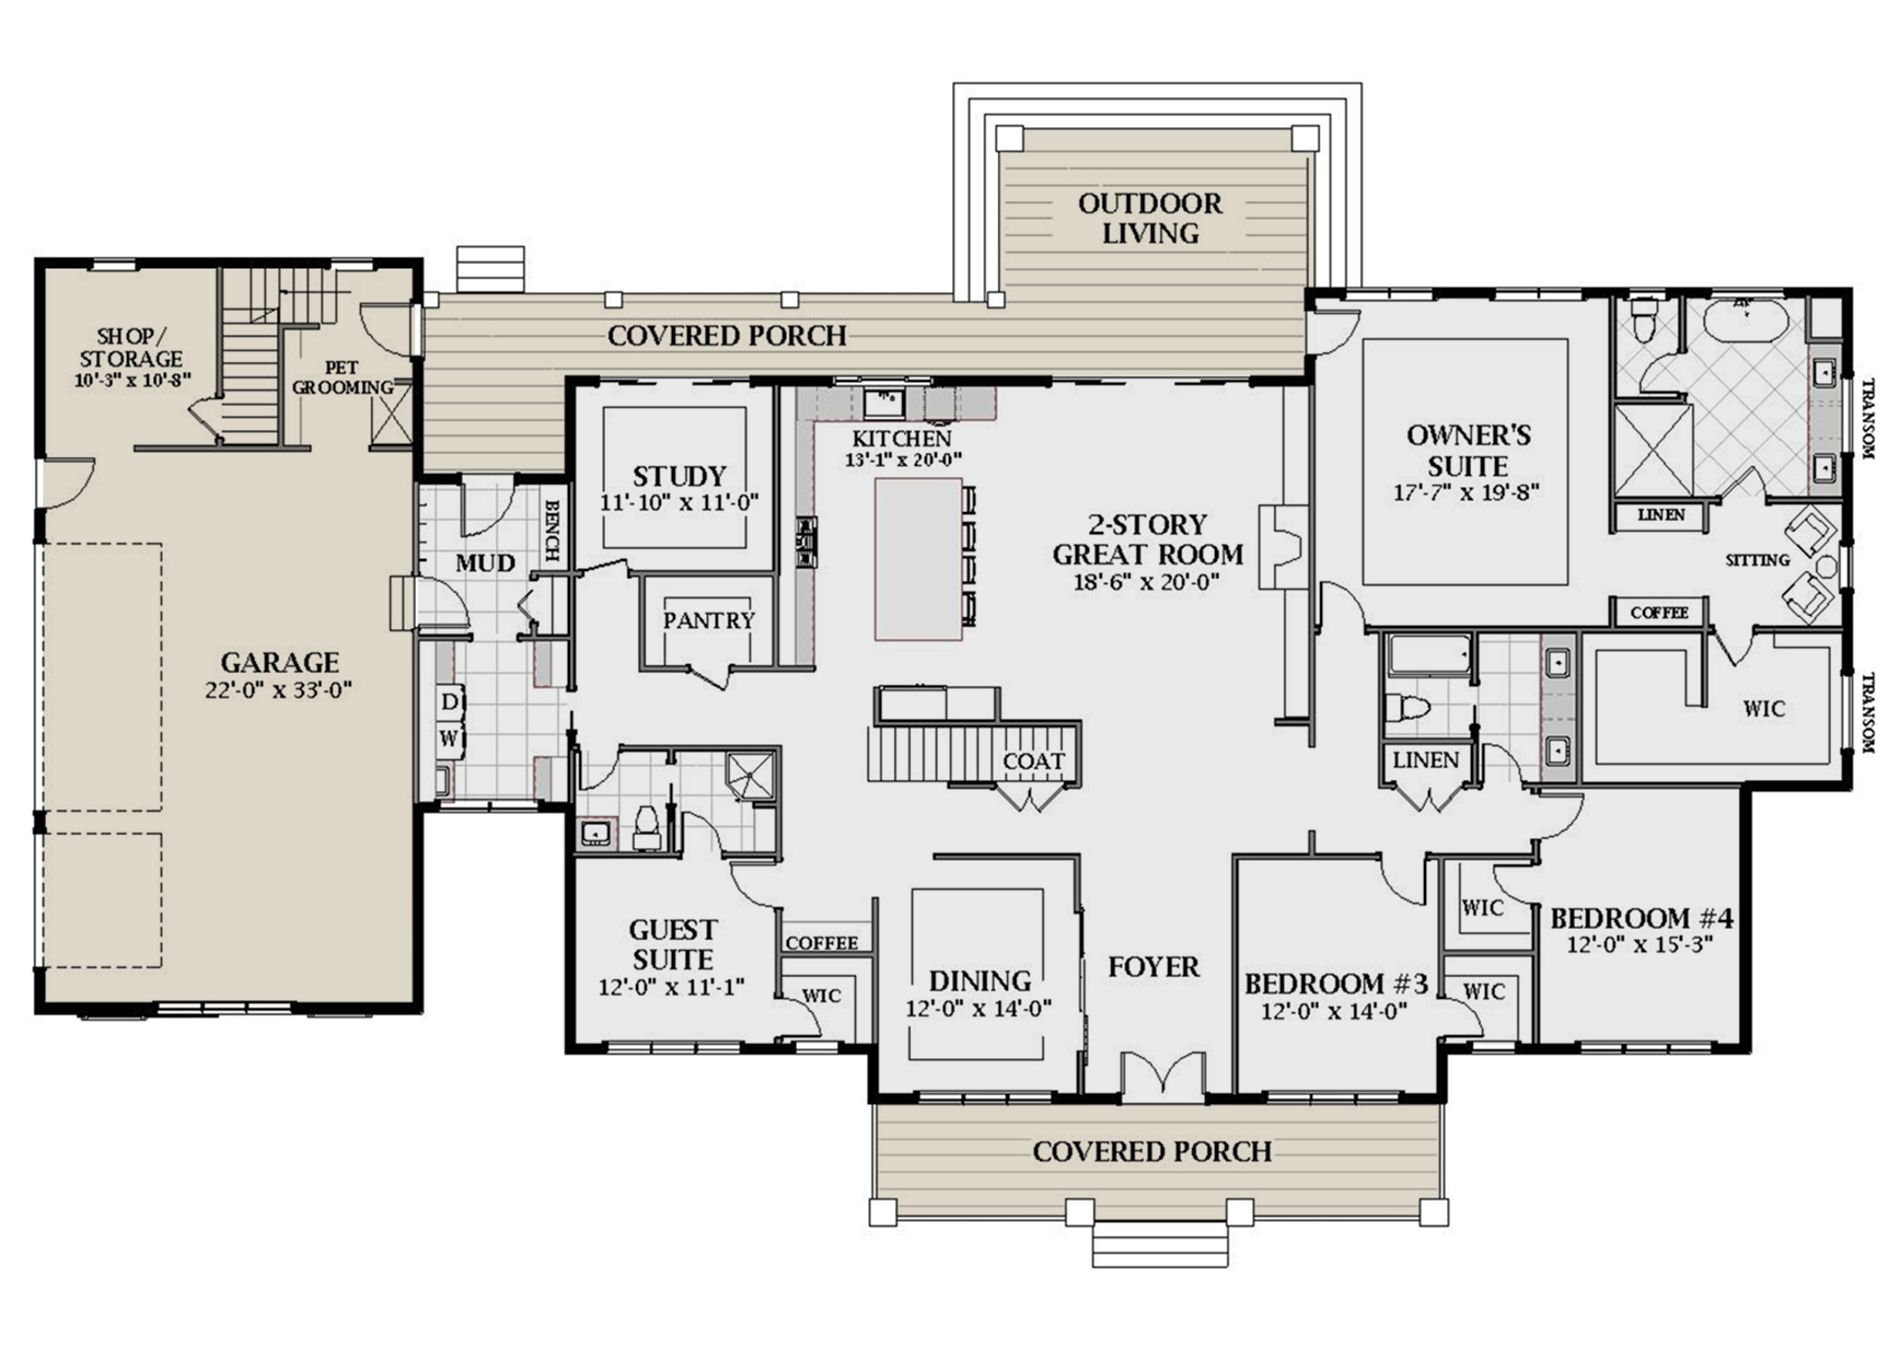 House Plan 6849 00089 Modern Farmhouse Plan 4 991 Square Feet